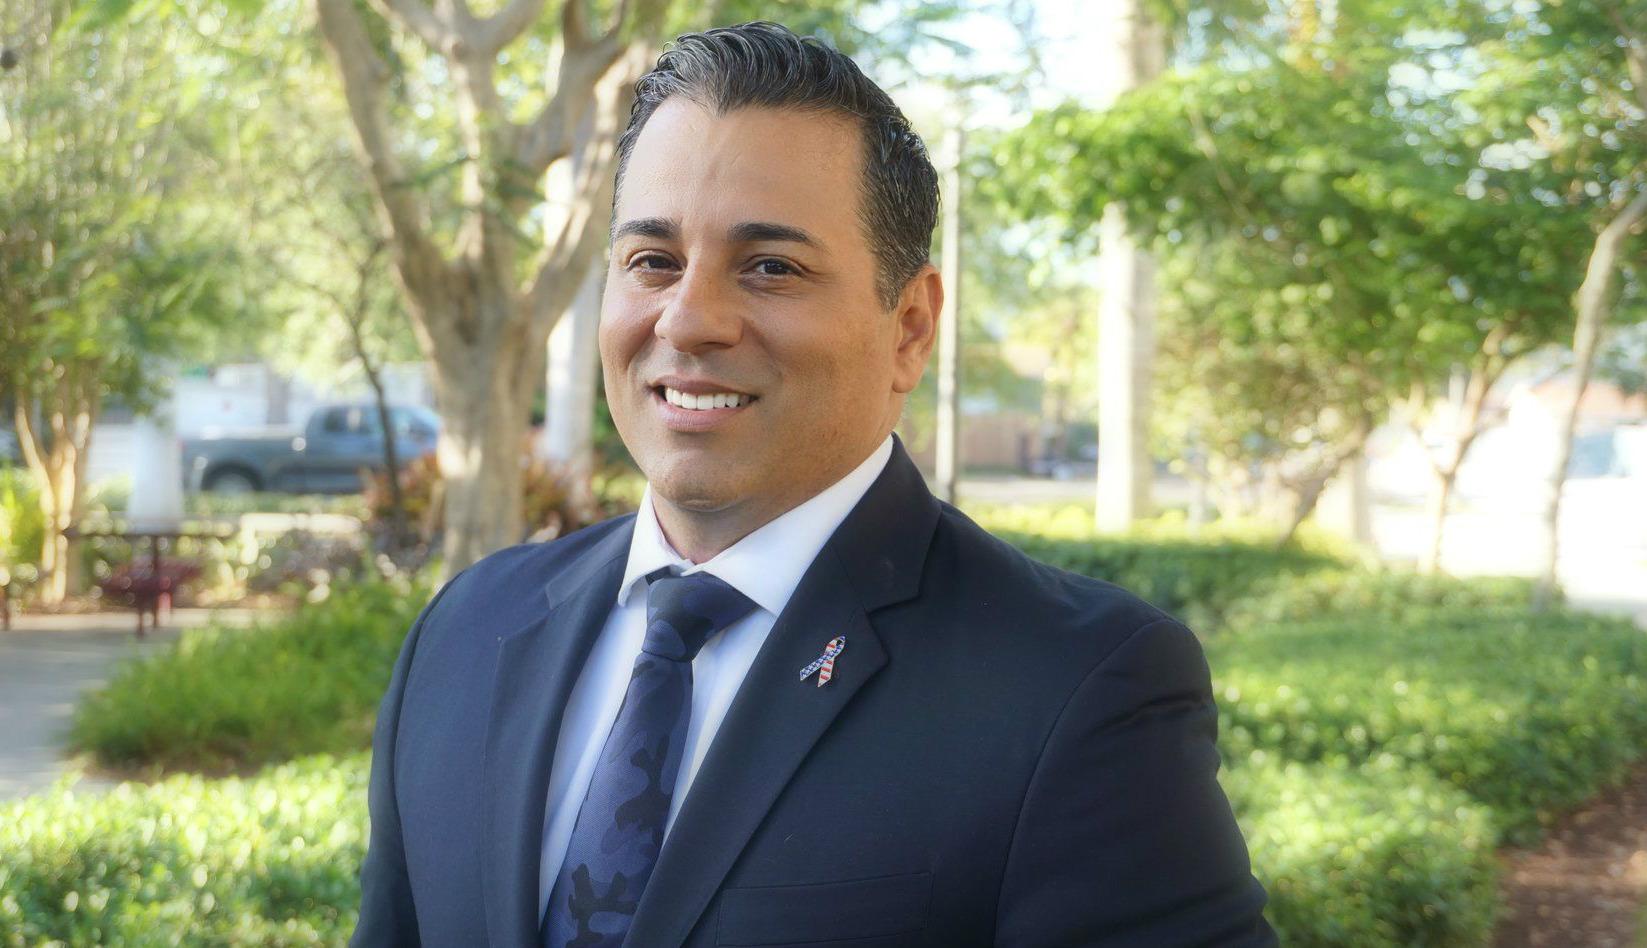 It's official. Manjarres announces congressional run against Democrat Ted Deutch